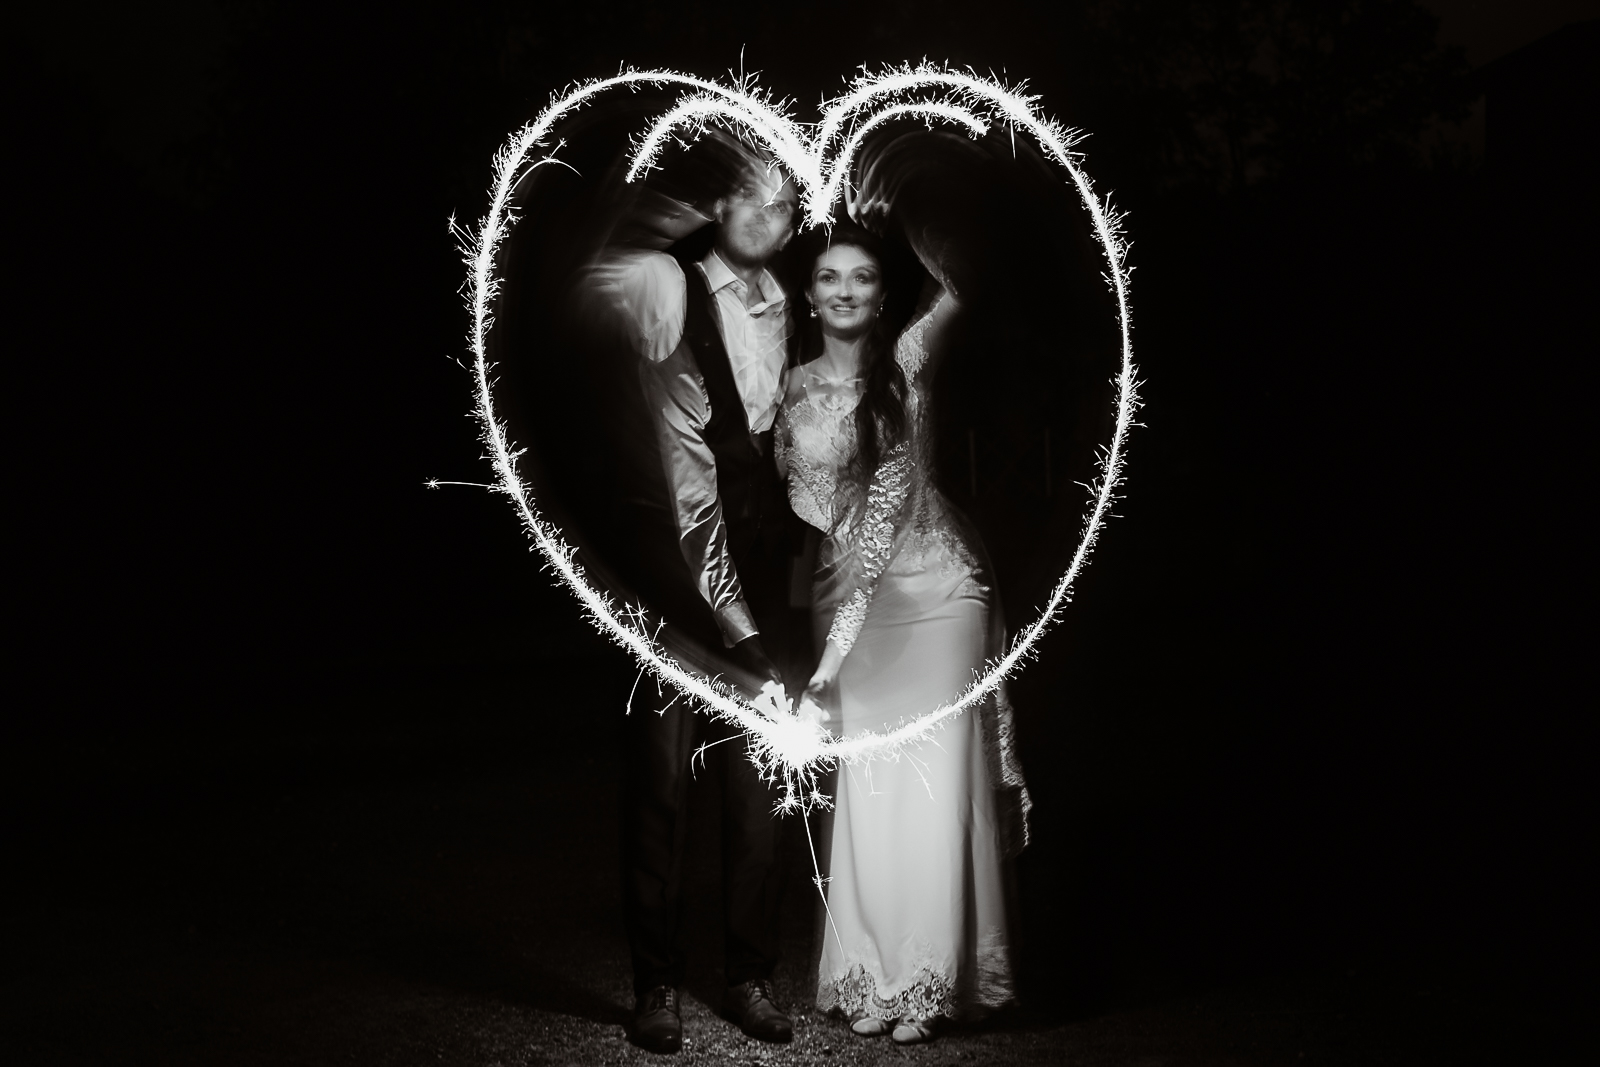 Steeve-Constanty-photographe-mariage-professionnel-portrait-evenementiel-thann-cernay-alsace